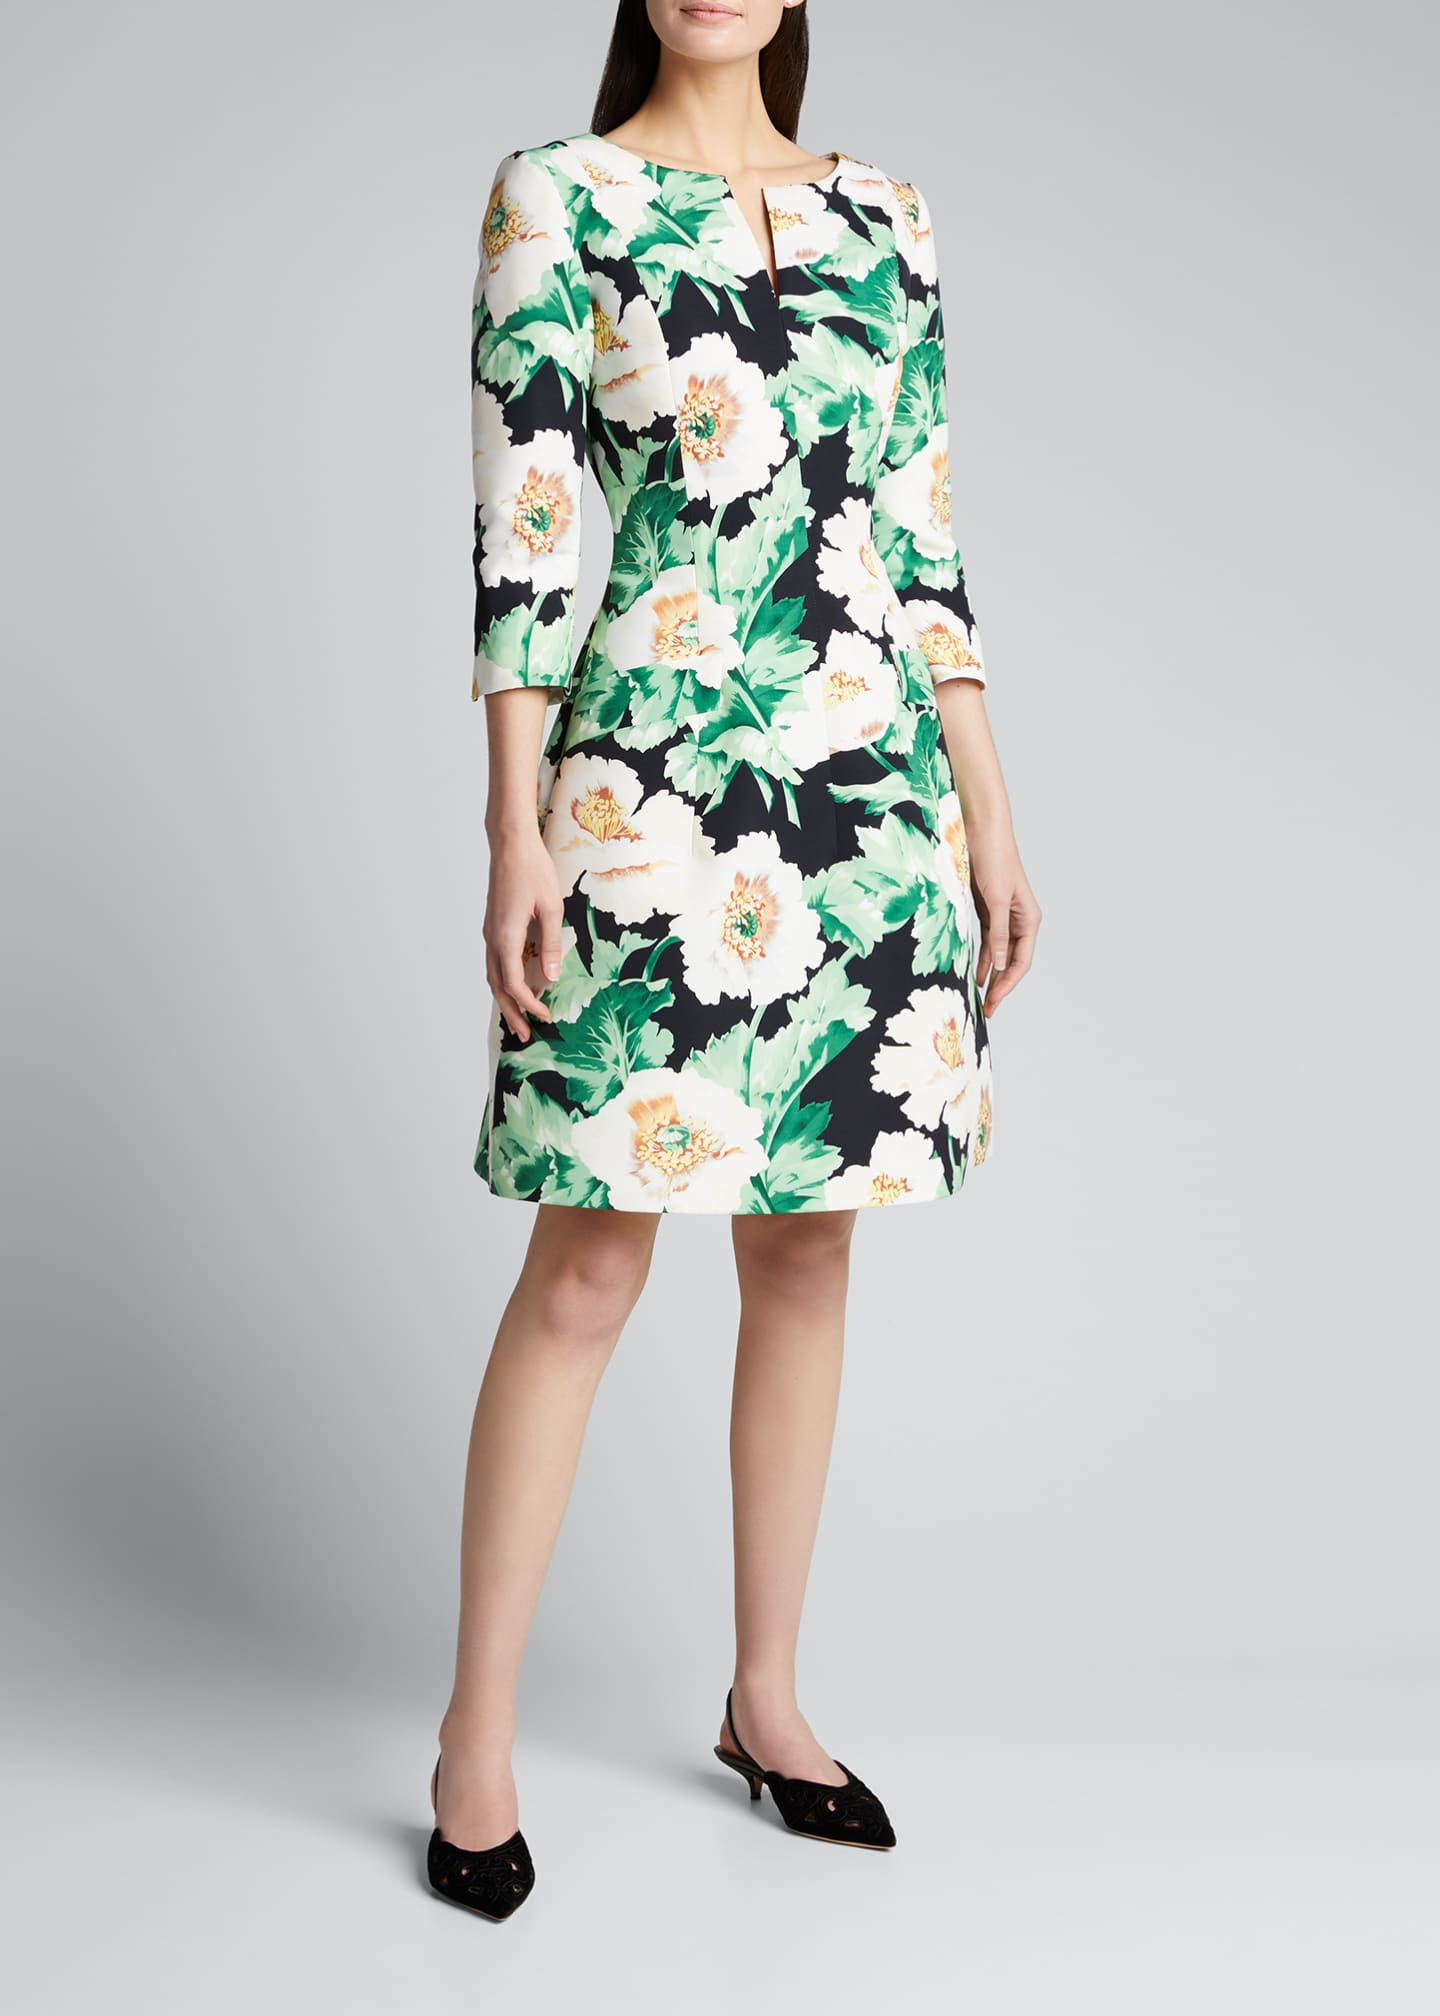 Oscar de la Renta 3/4-Sleeve Floral Dress - Bergdorf Goodman